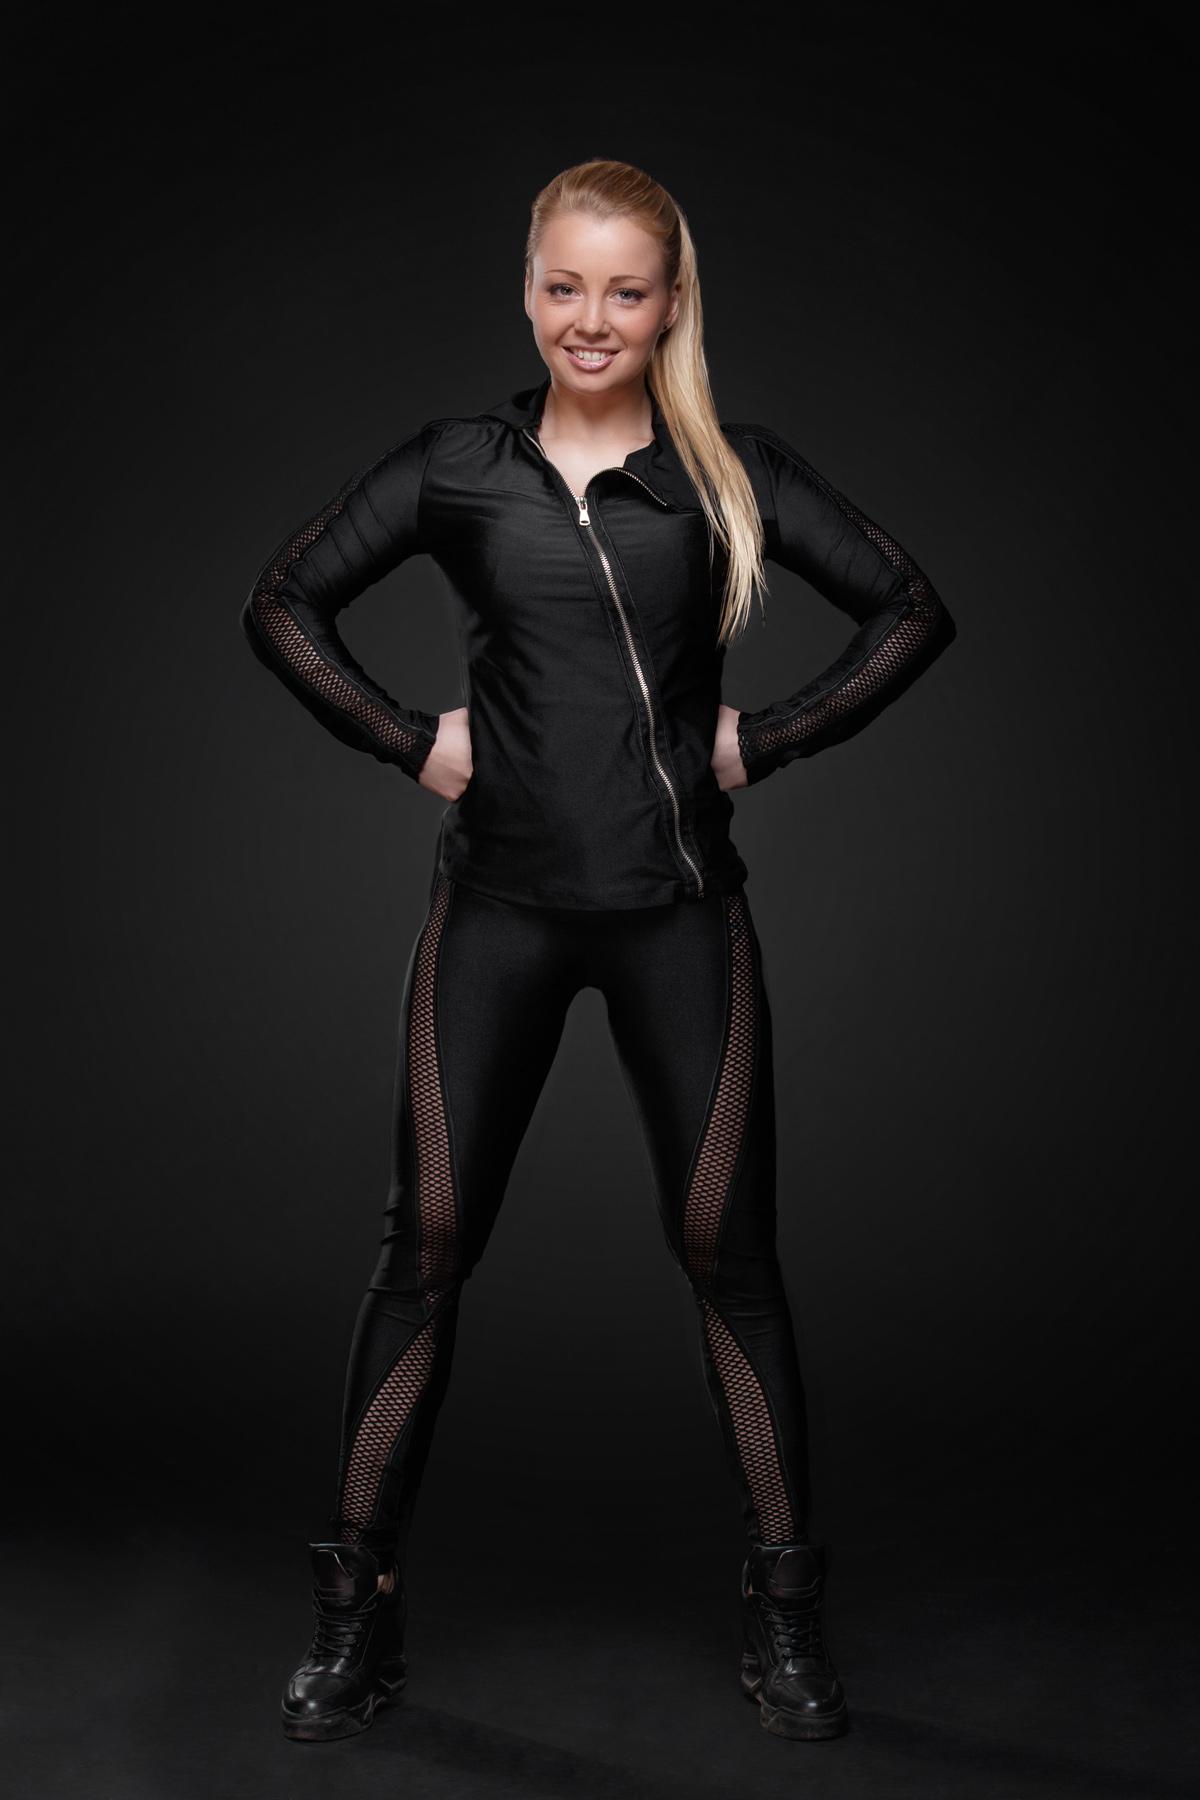 costume for pole dancer secret maxi